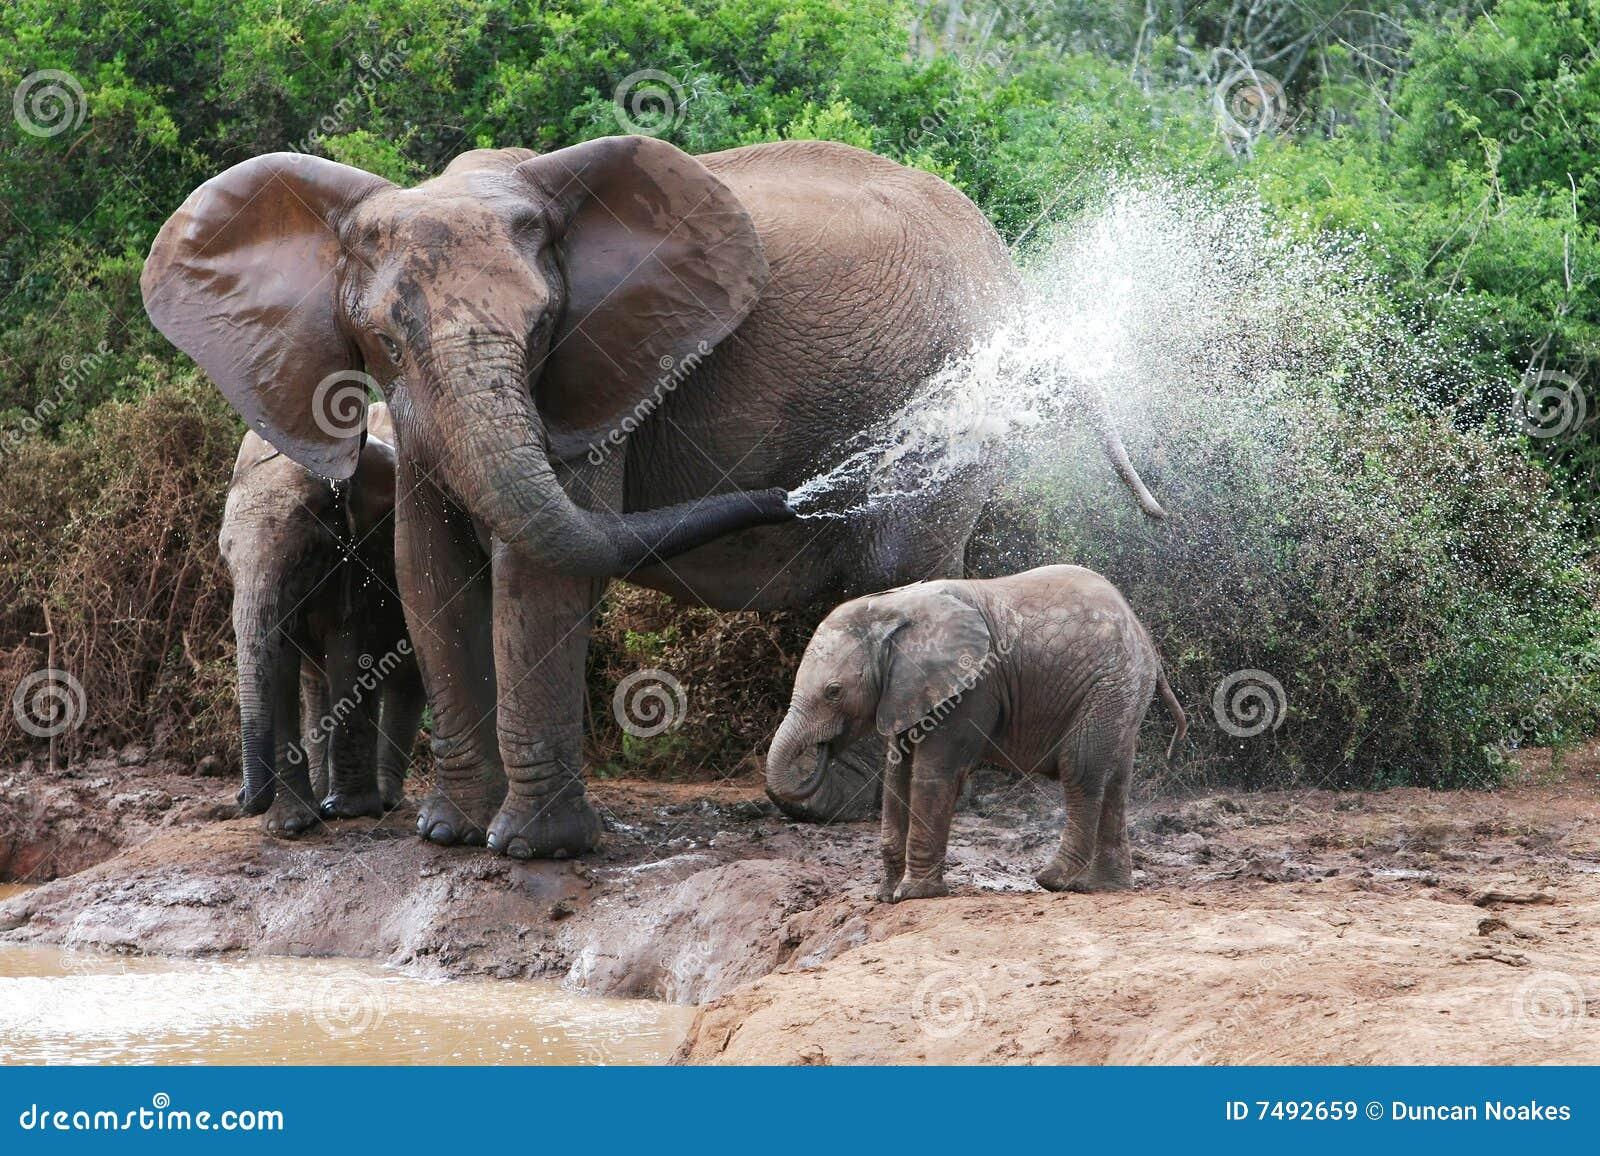 Elephant spraying water - photo#1